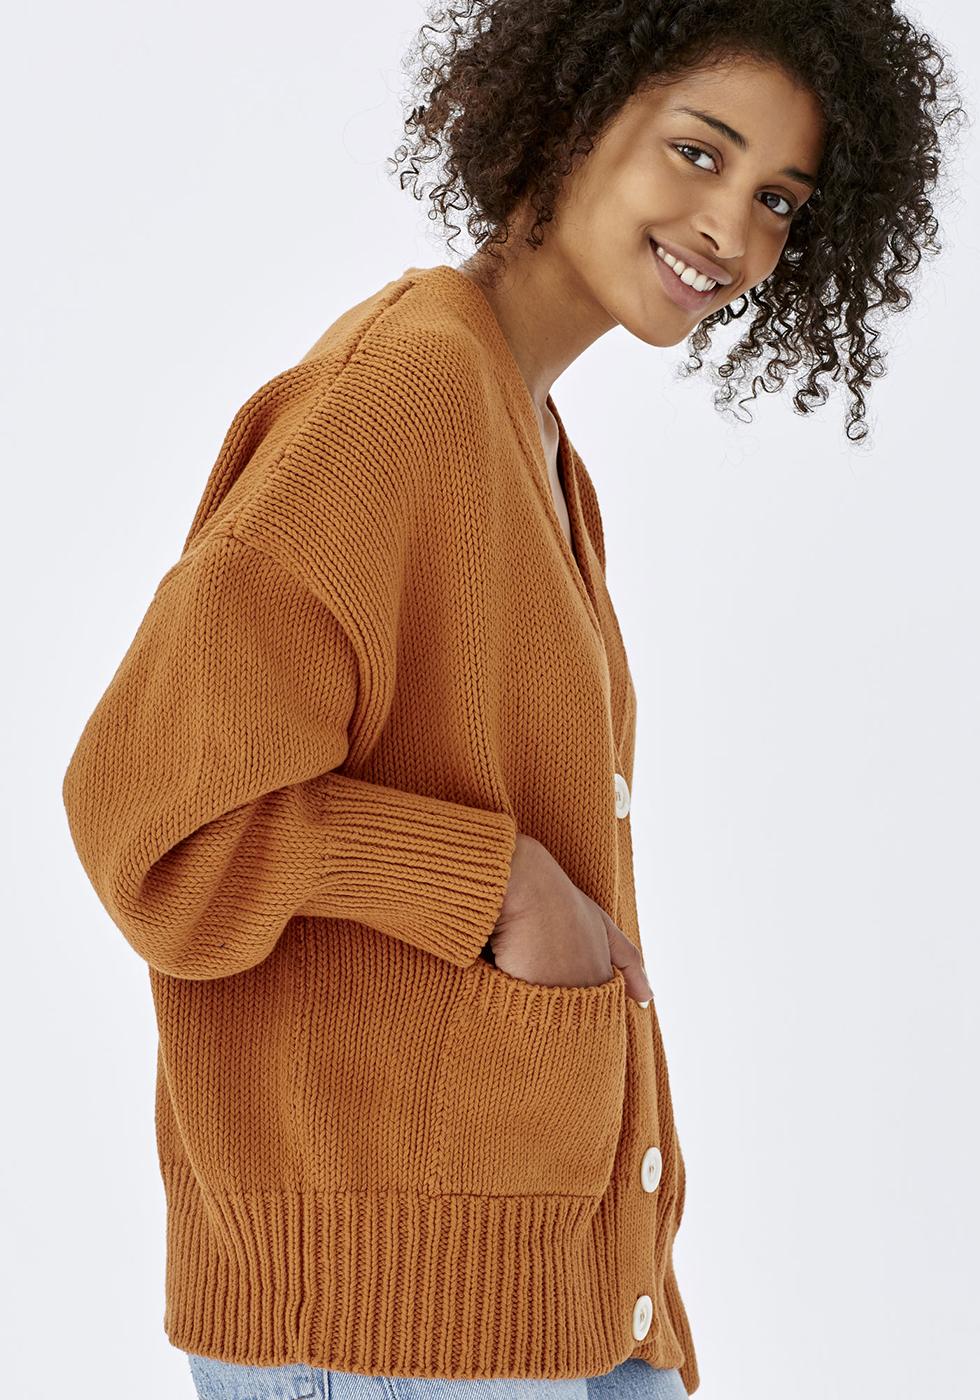 Style Chic: Babaa Knitwear!